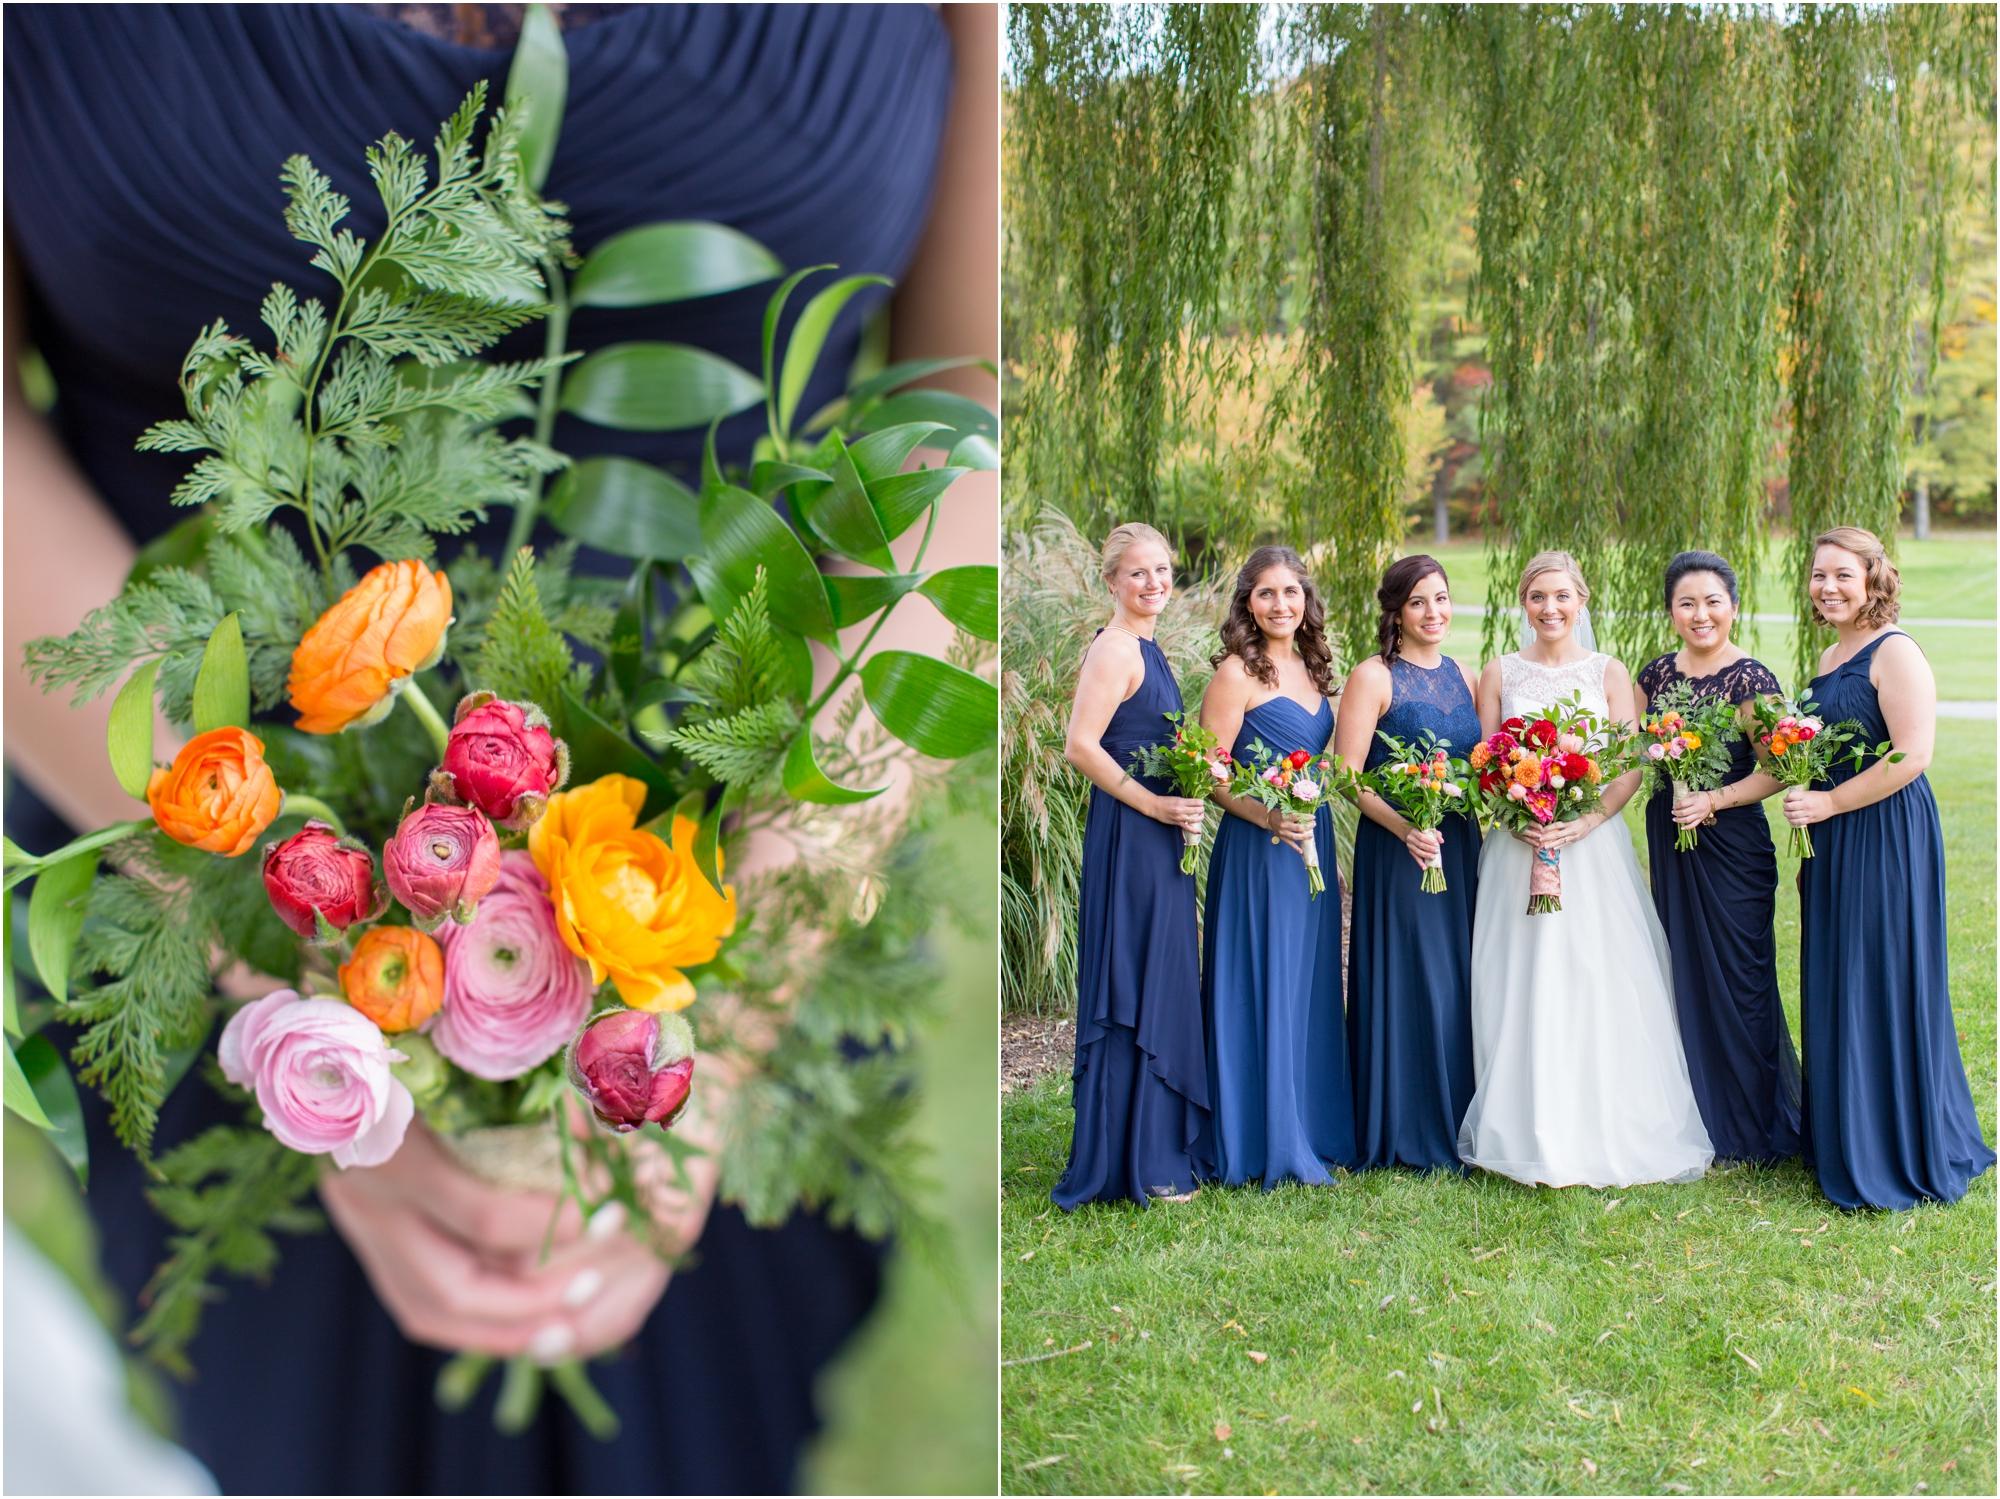 3-Finkel Wedding Bridal Party-447_anna grace photography maryland wedding photographer turf valley.jpg